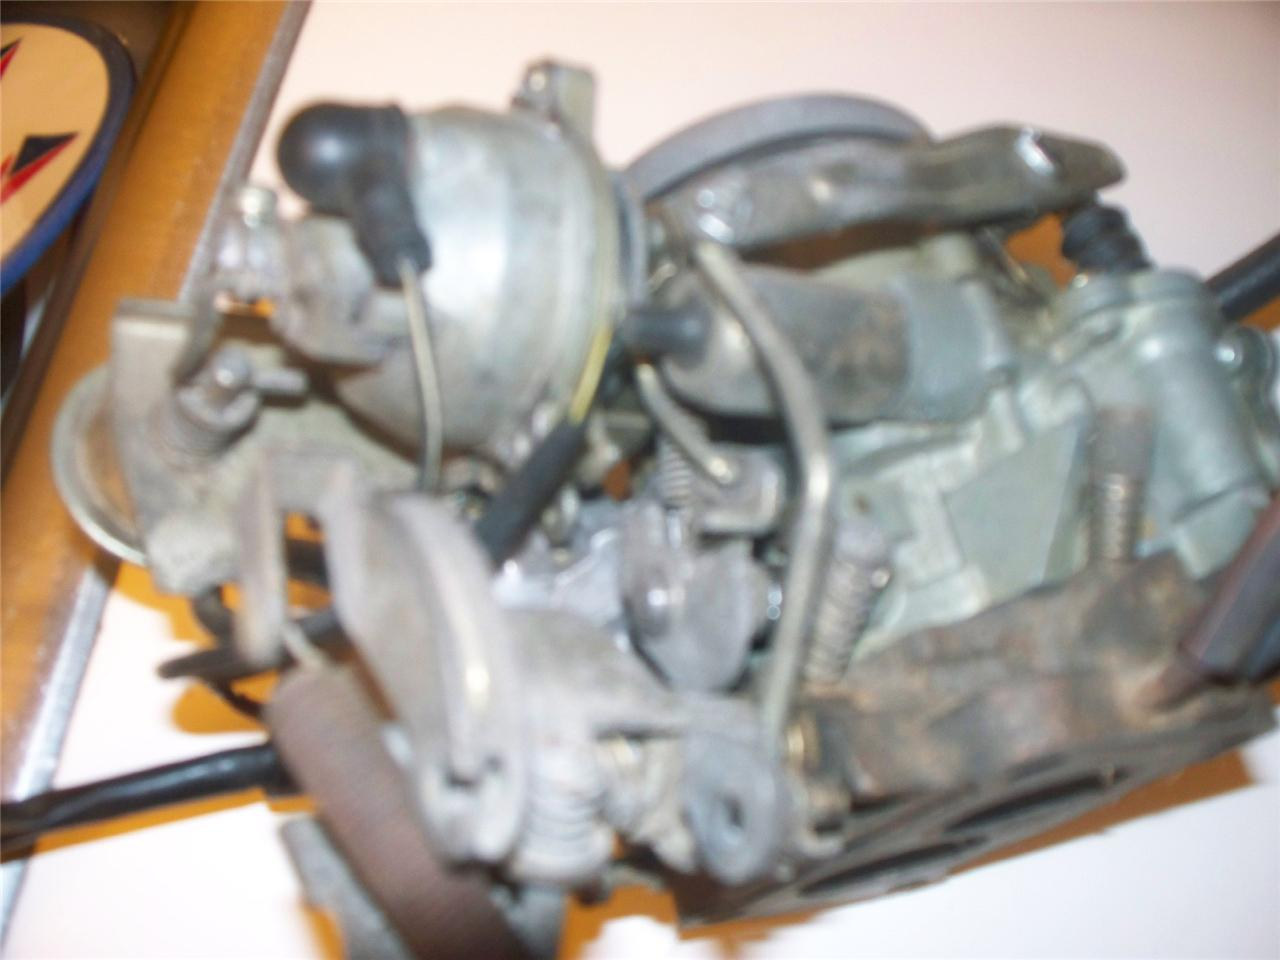 1980 Chevy Luv Vacuum Diagram Fuse Box Luvtruck Com U View Topic Carb Help Forums 1280x960